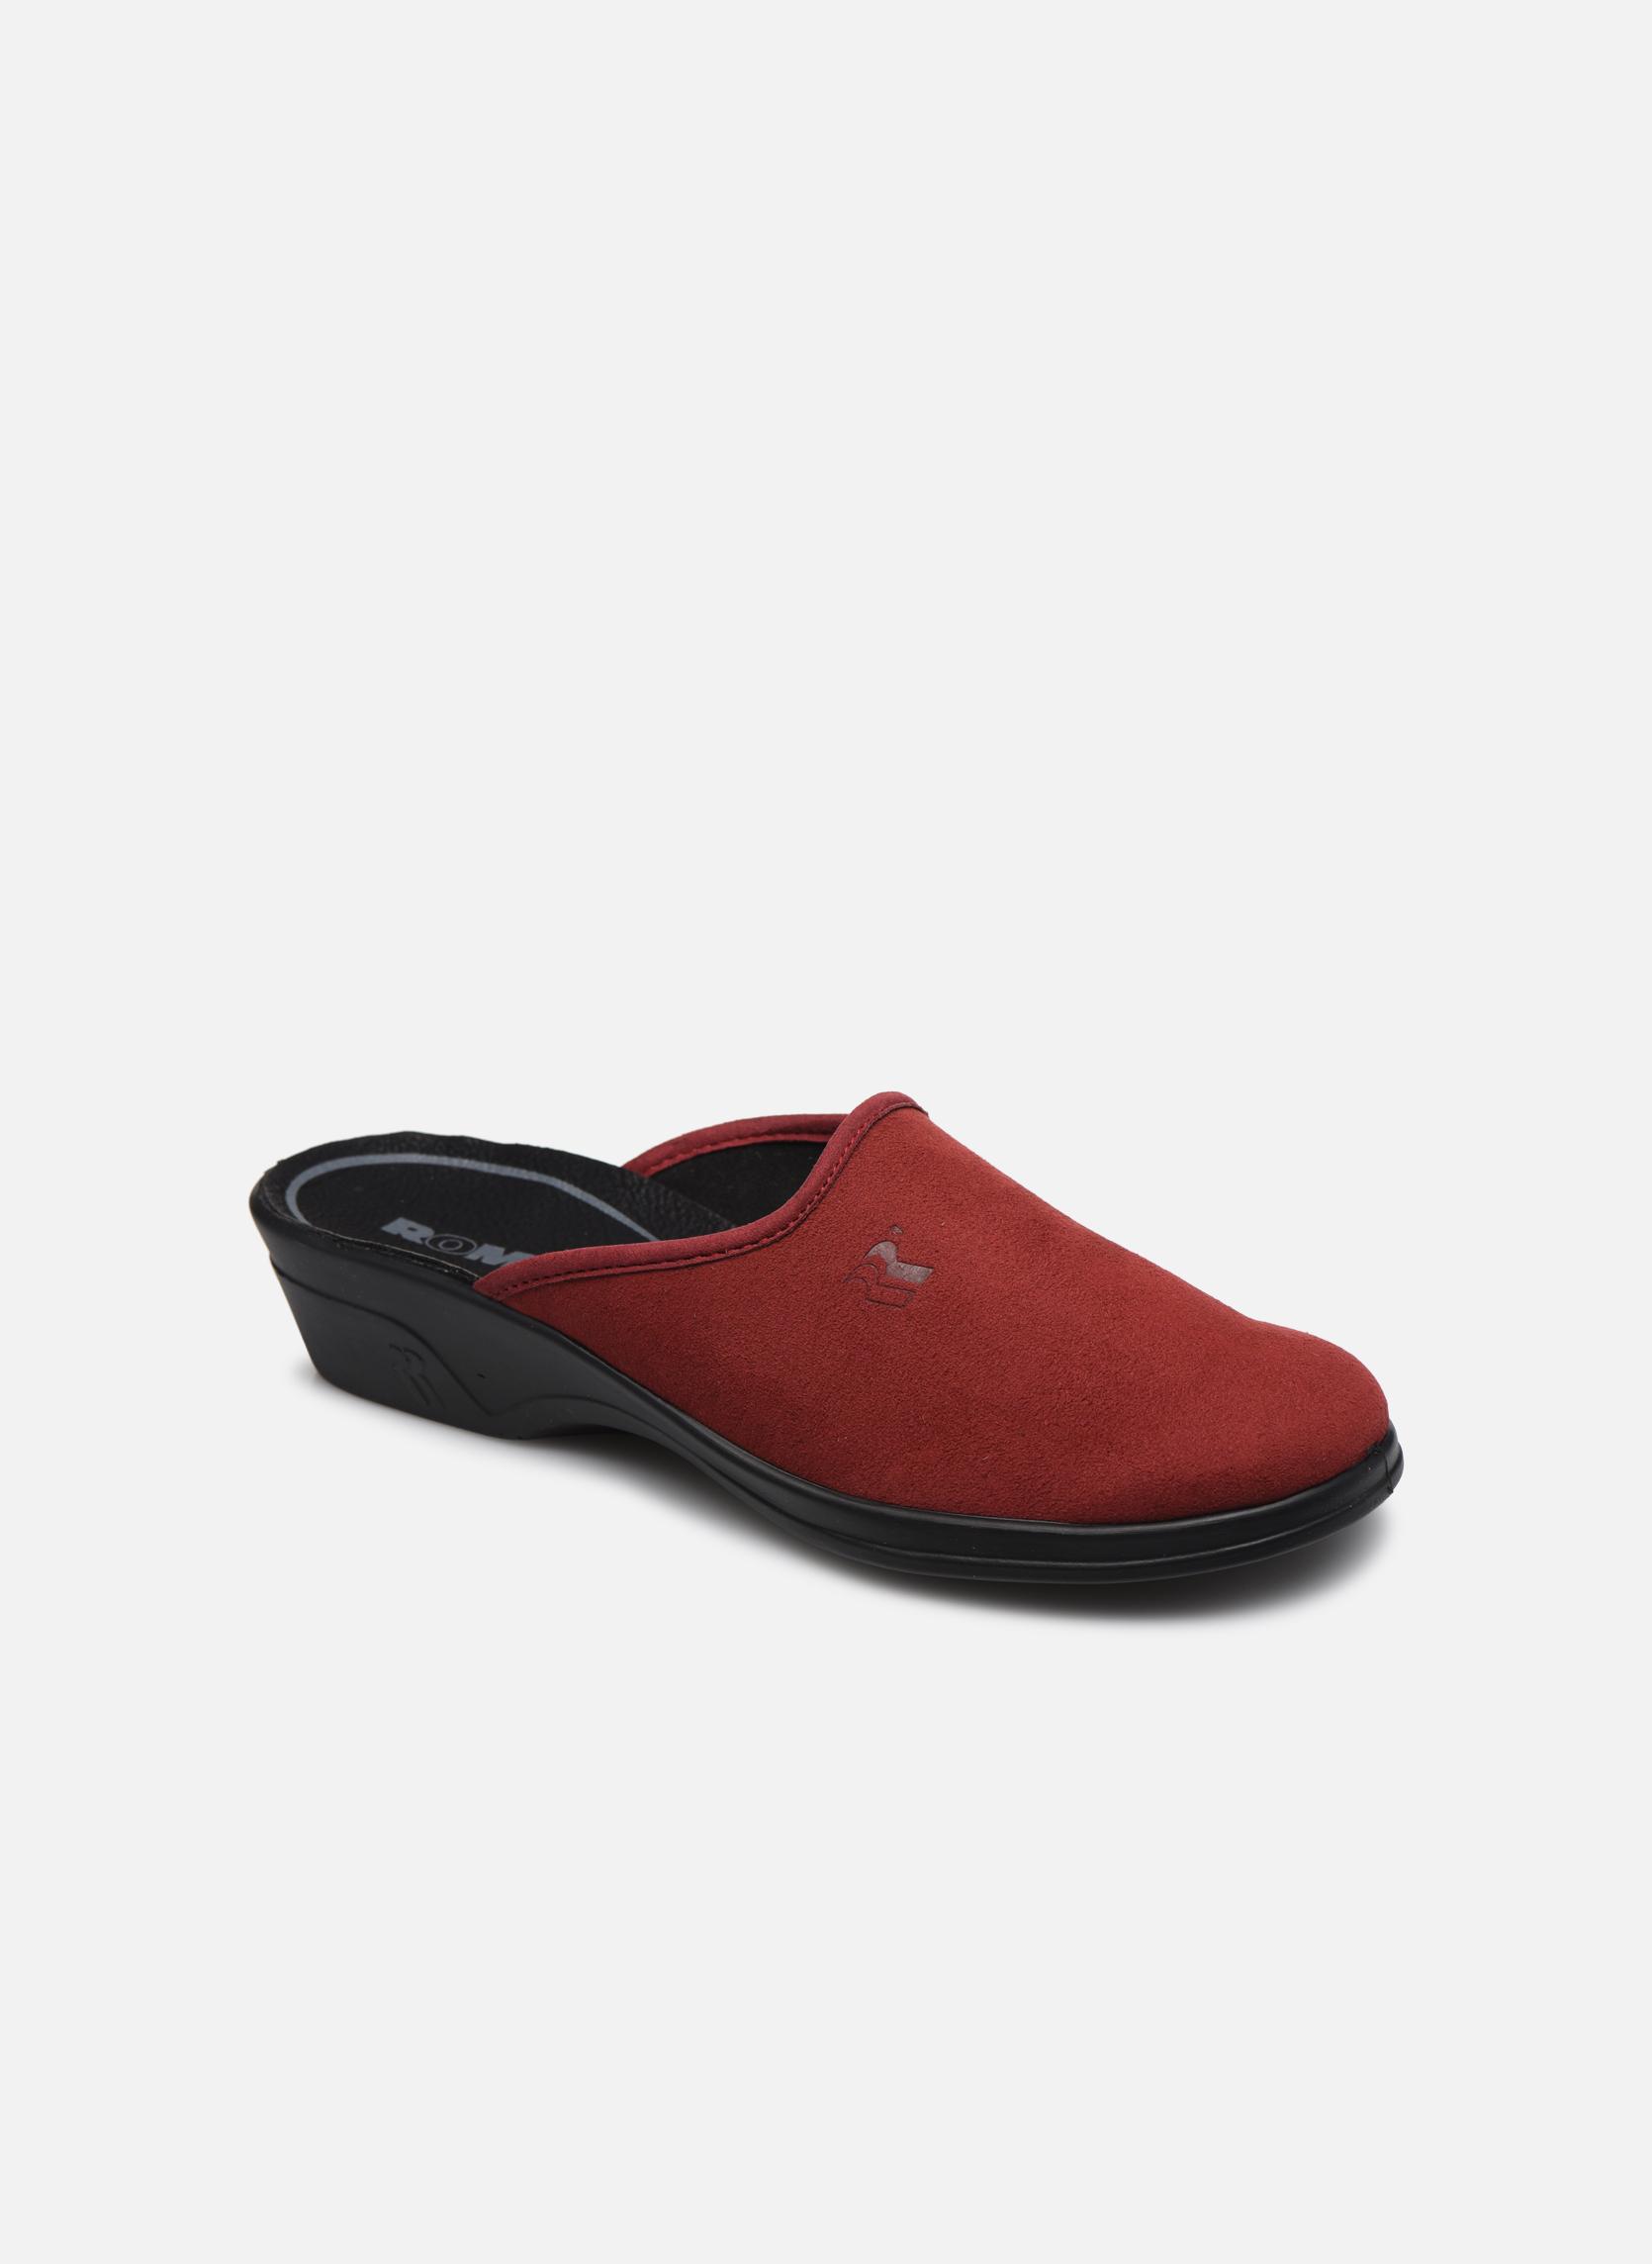 Pantoffels Dames Remo 122